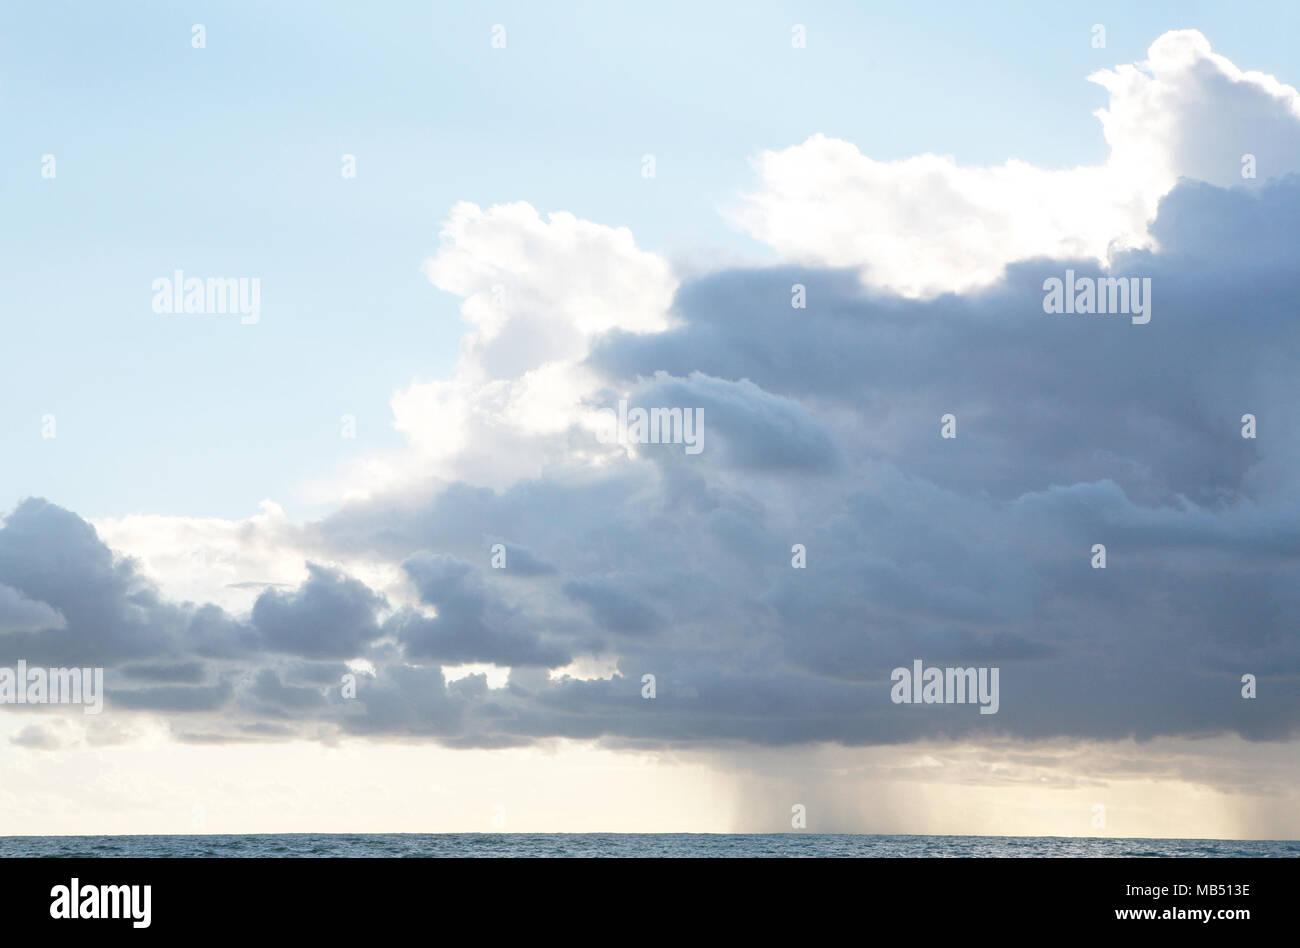 Storm rain cloud over the sea - Stock Image